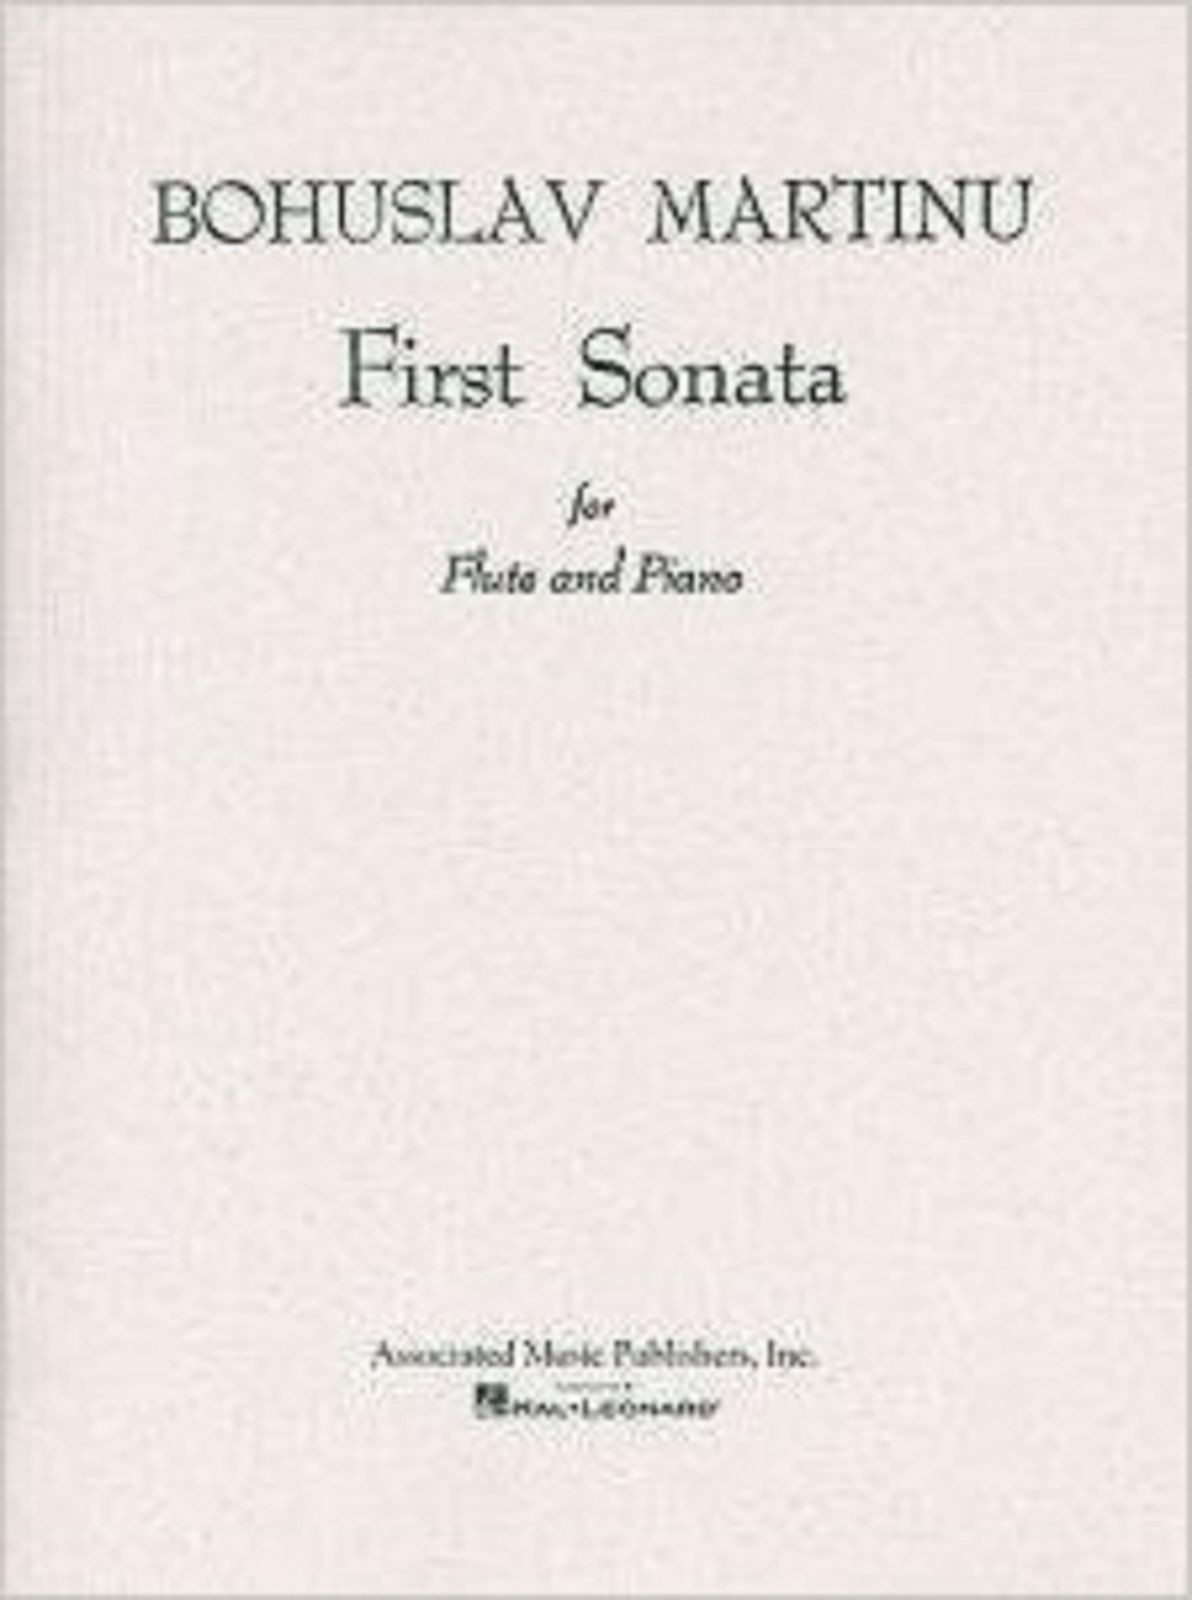 Bohuslav Martinu First Sonata For Flute And Piano Sheet Music Book S171